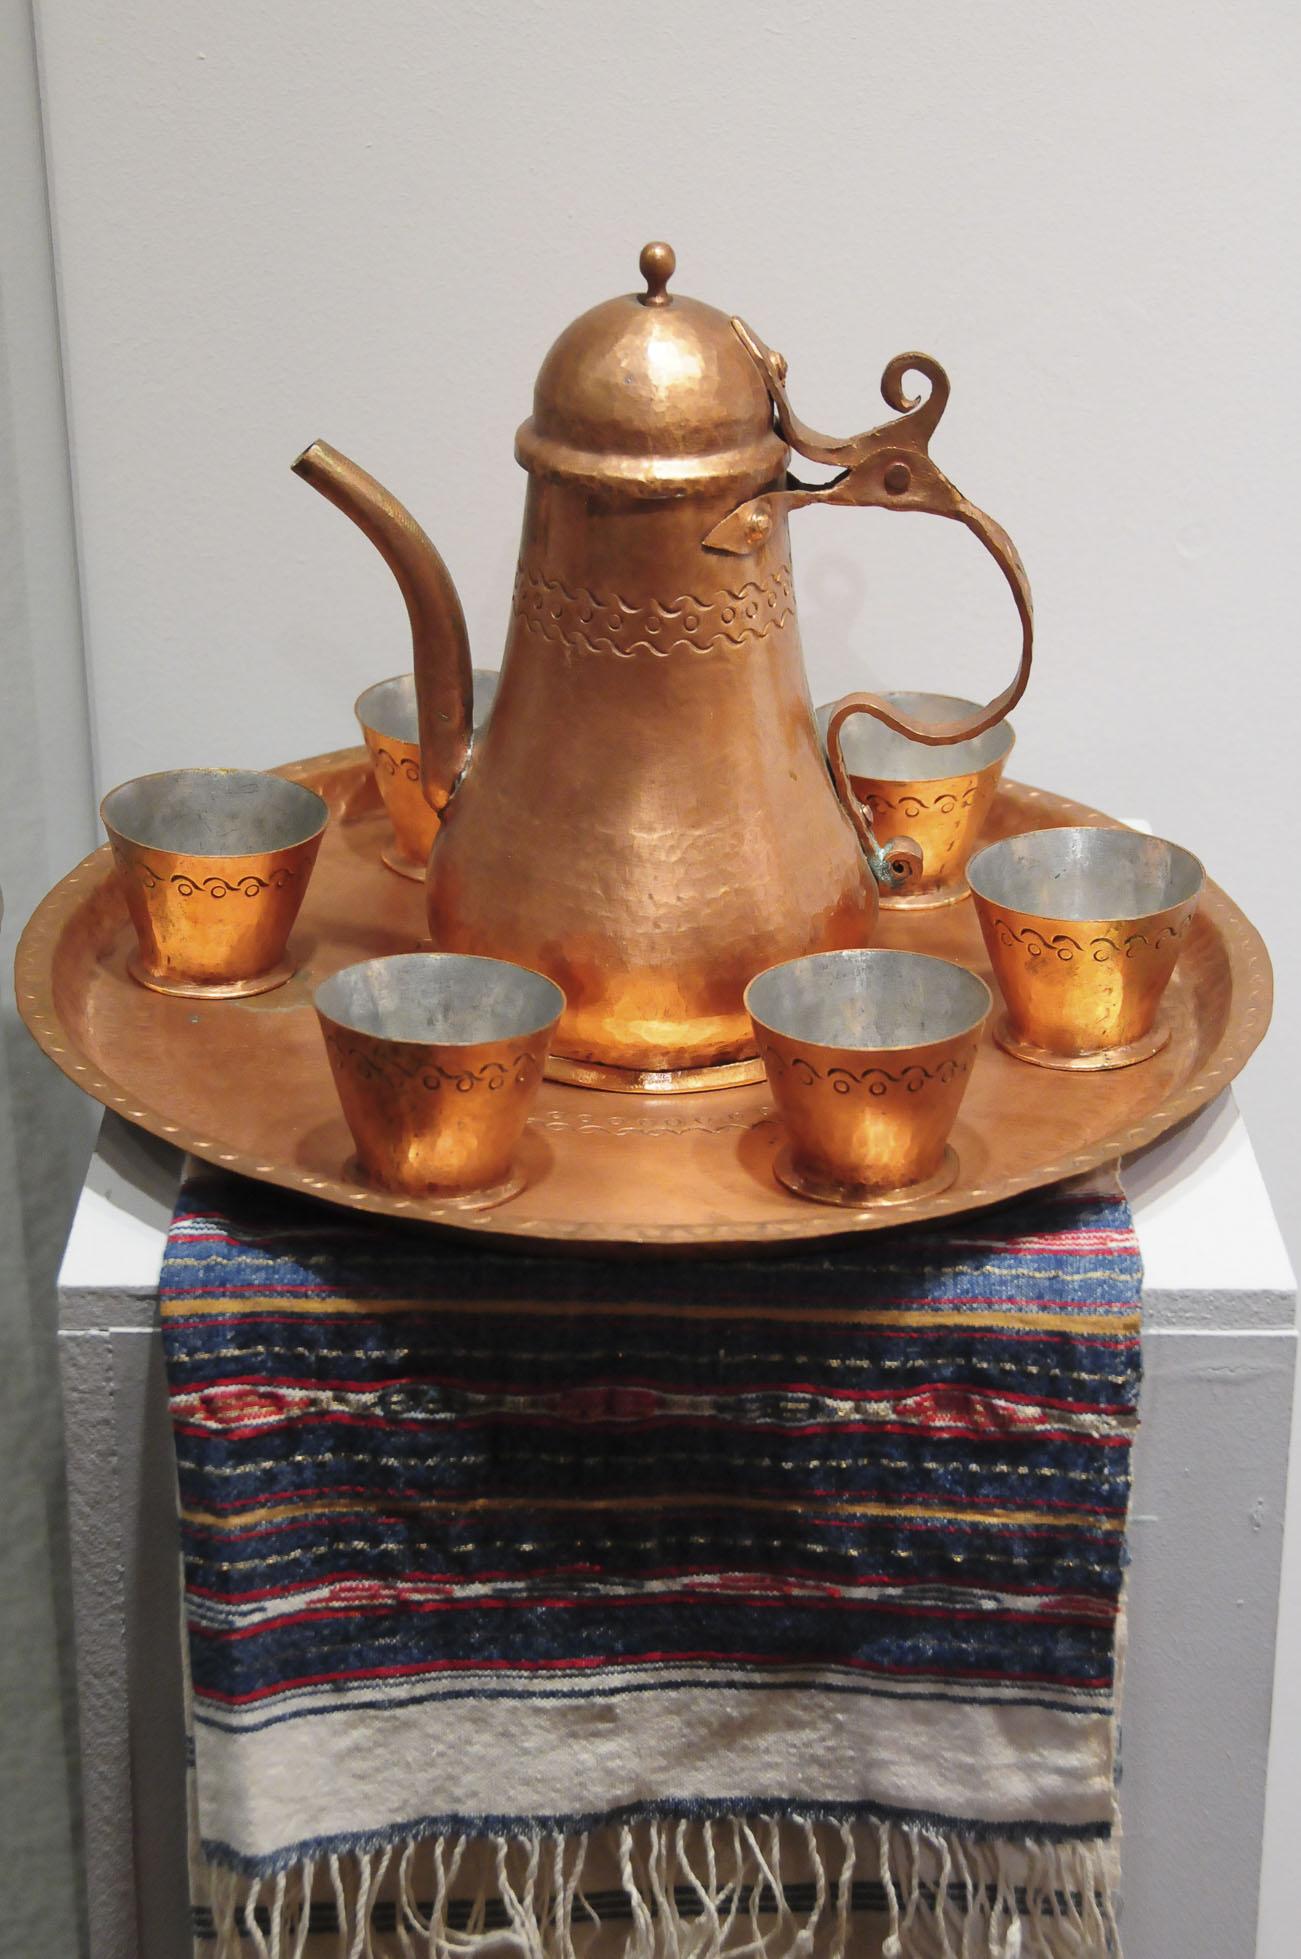 troyan-museum-mednikarstvo-ot-troyanskiq-krai-9